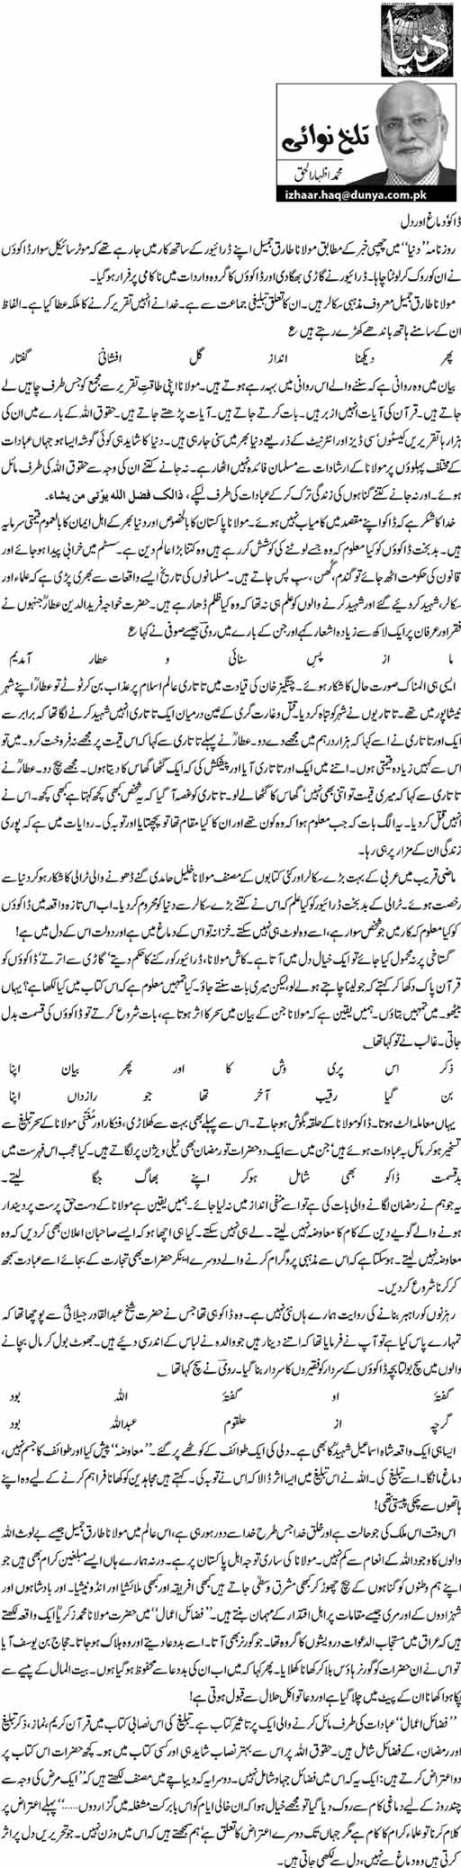 Dako Dimagh Aur Dil - M. Izhar ul Haq